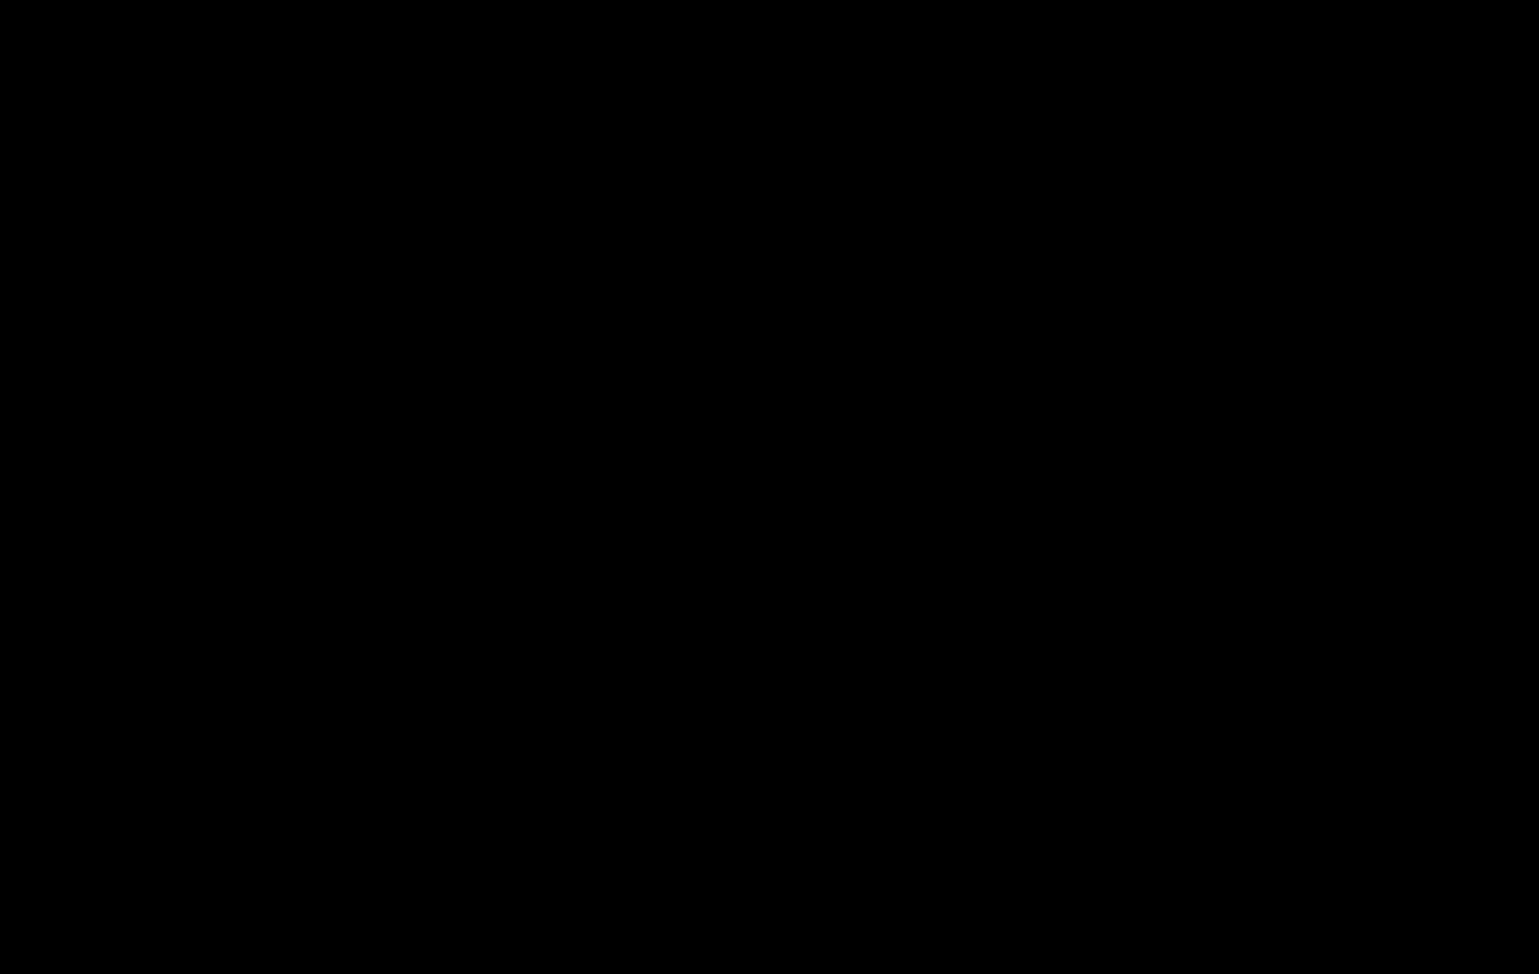 (6R,7S)-Cefoperazone